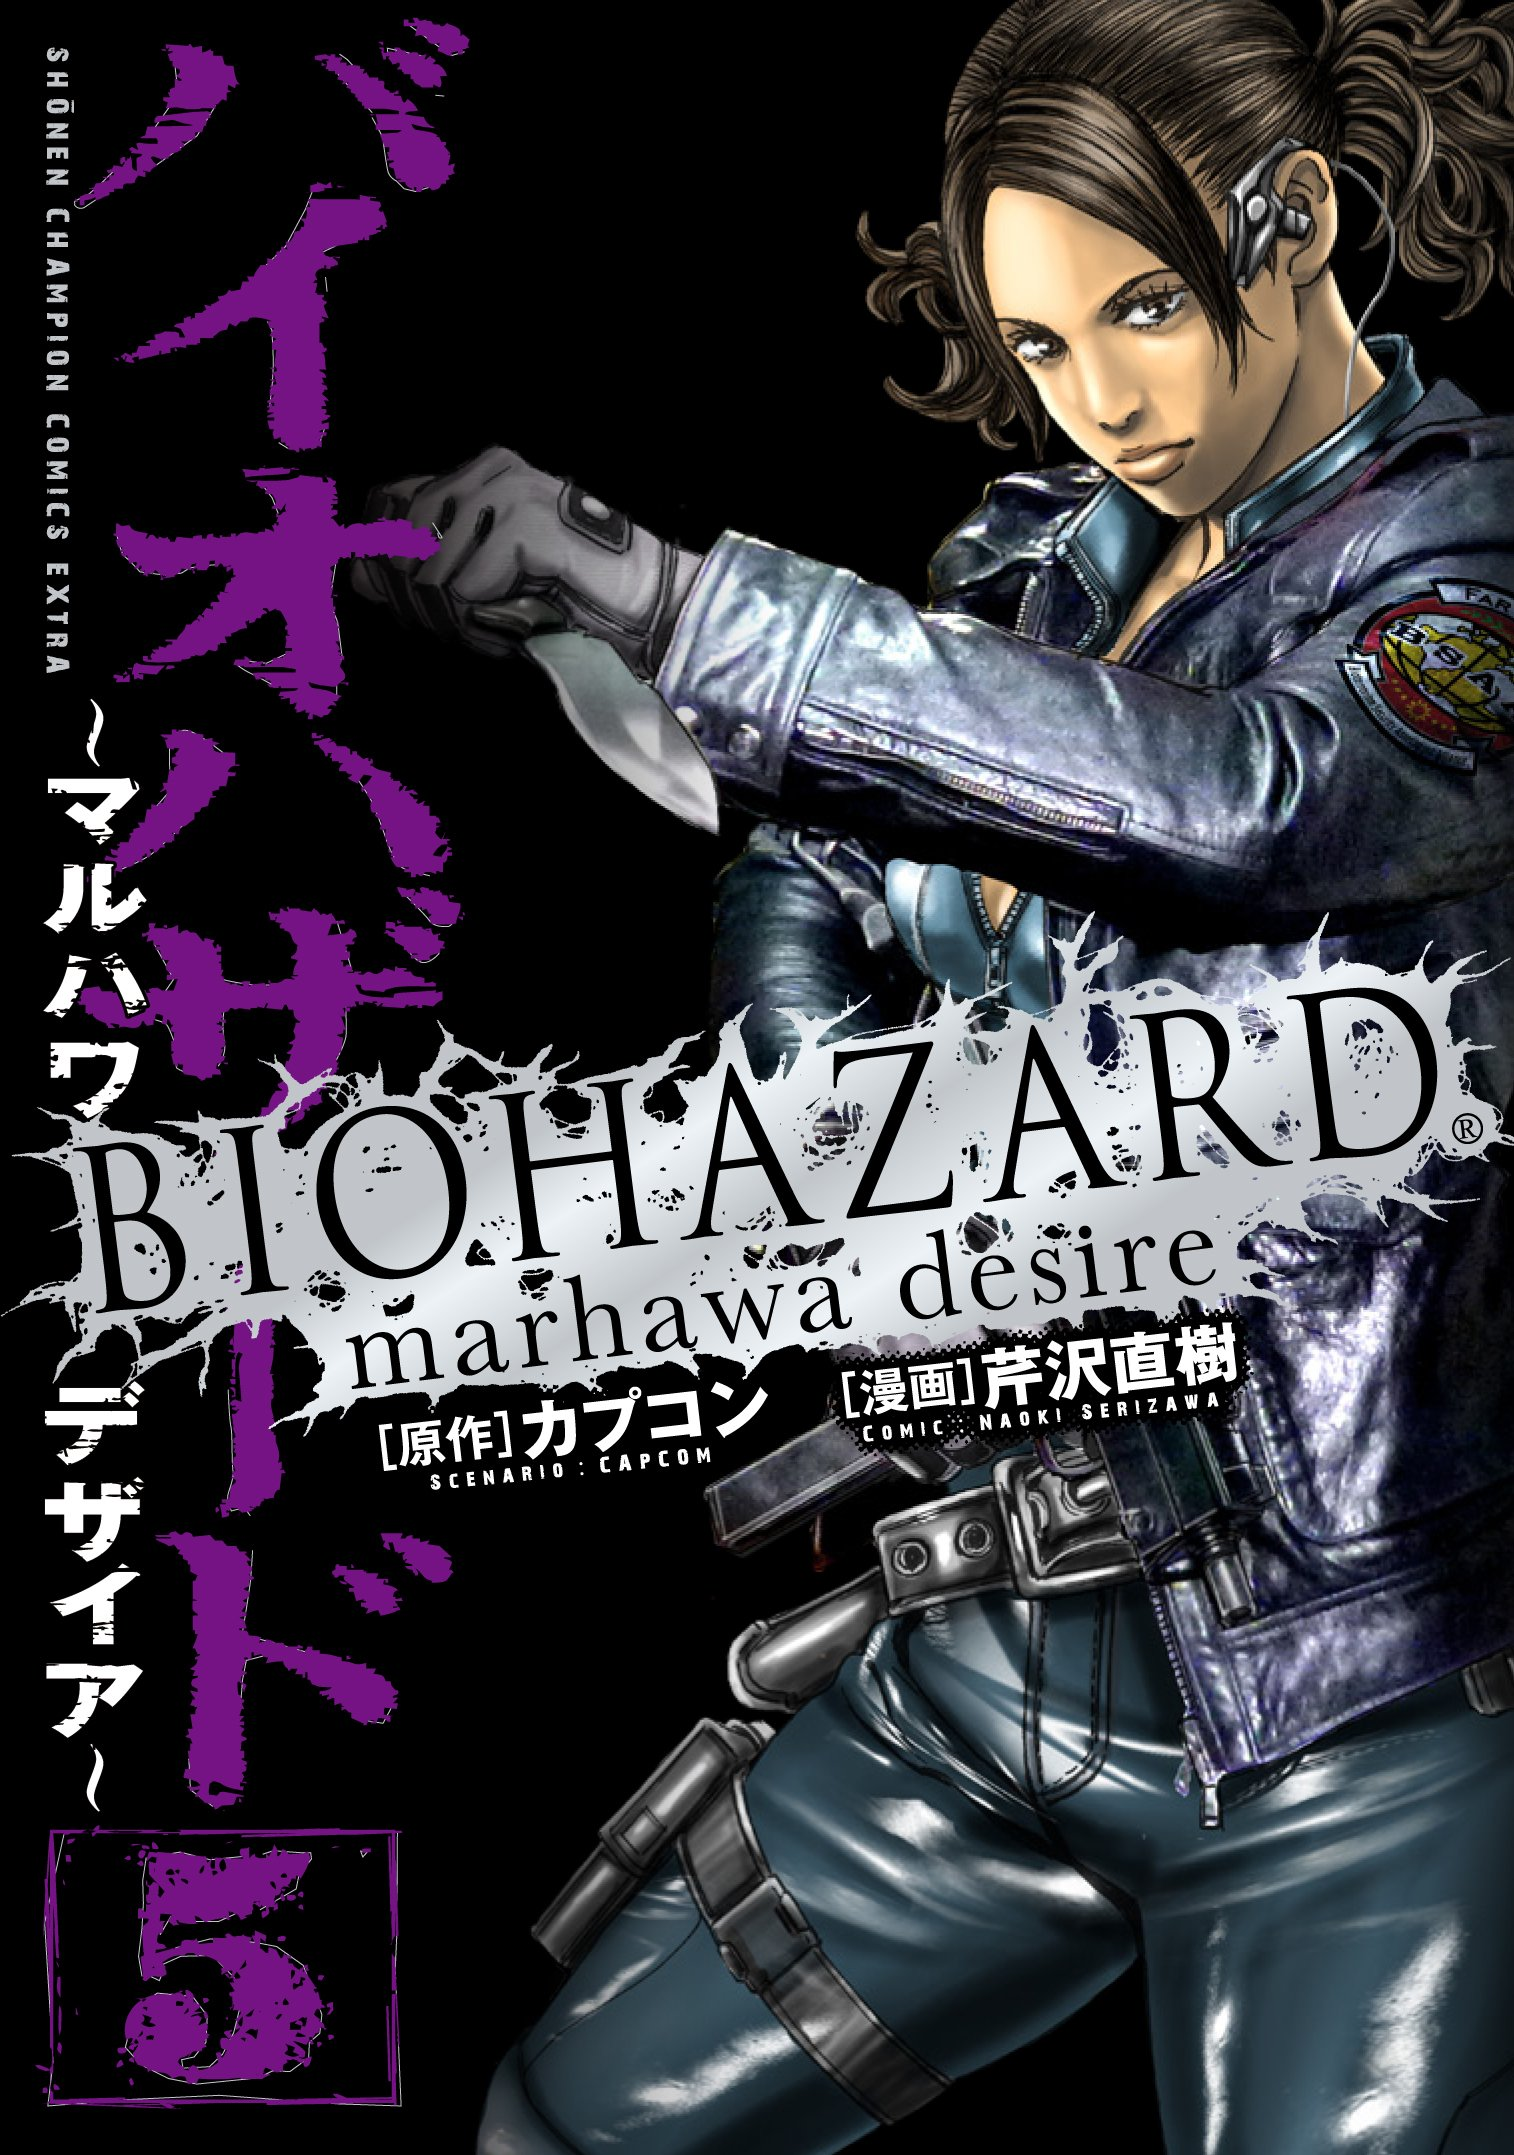 biohazard-marhawa-desire-05-akita.jpg